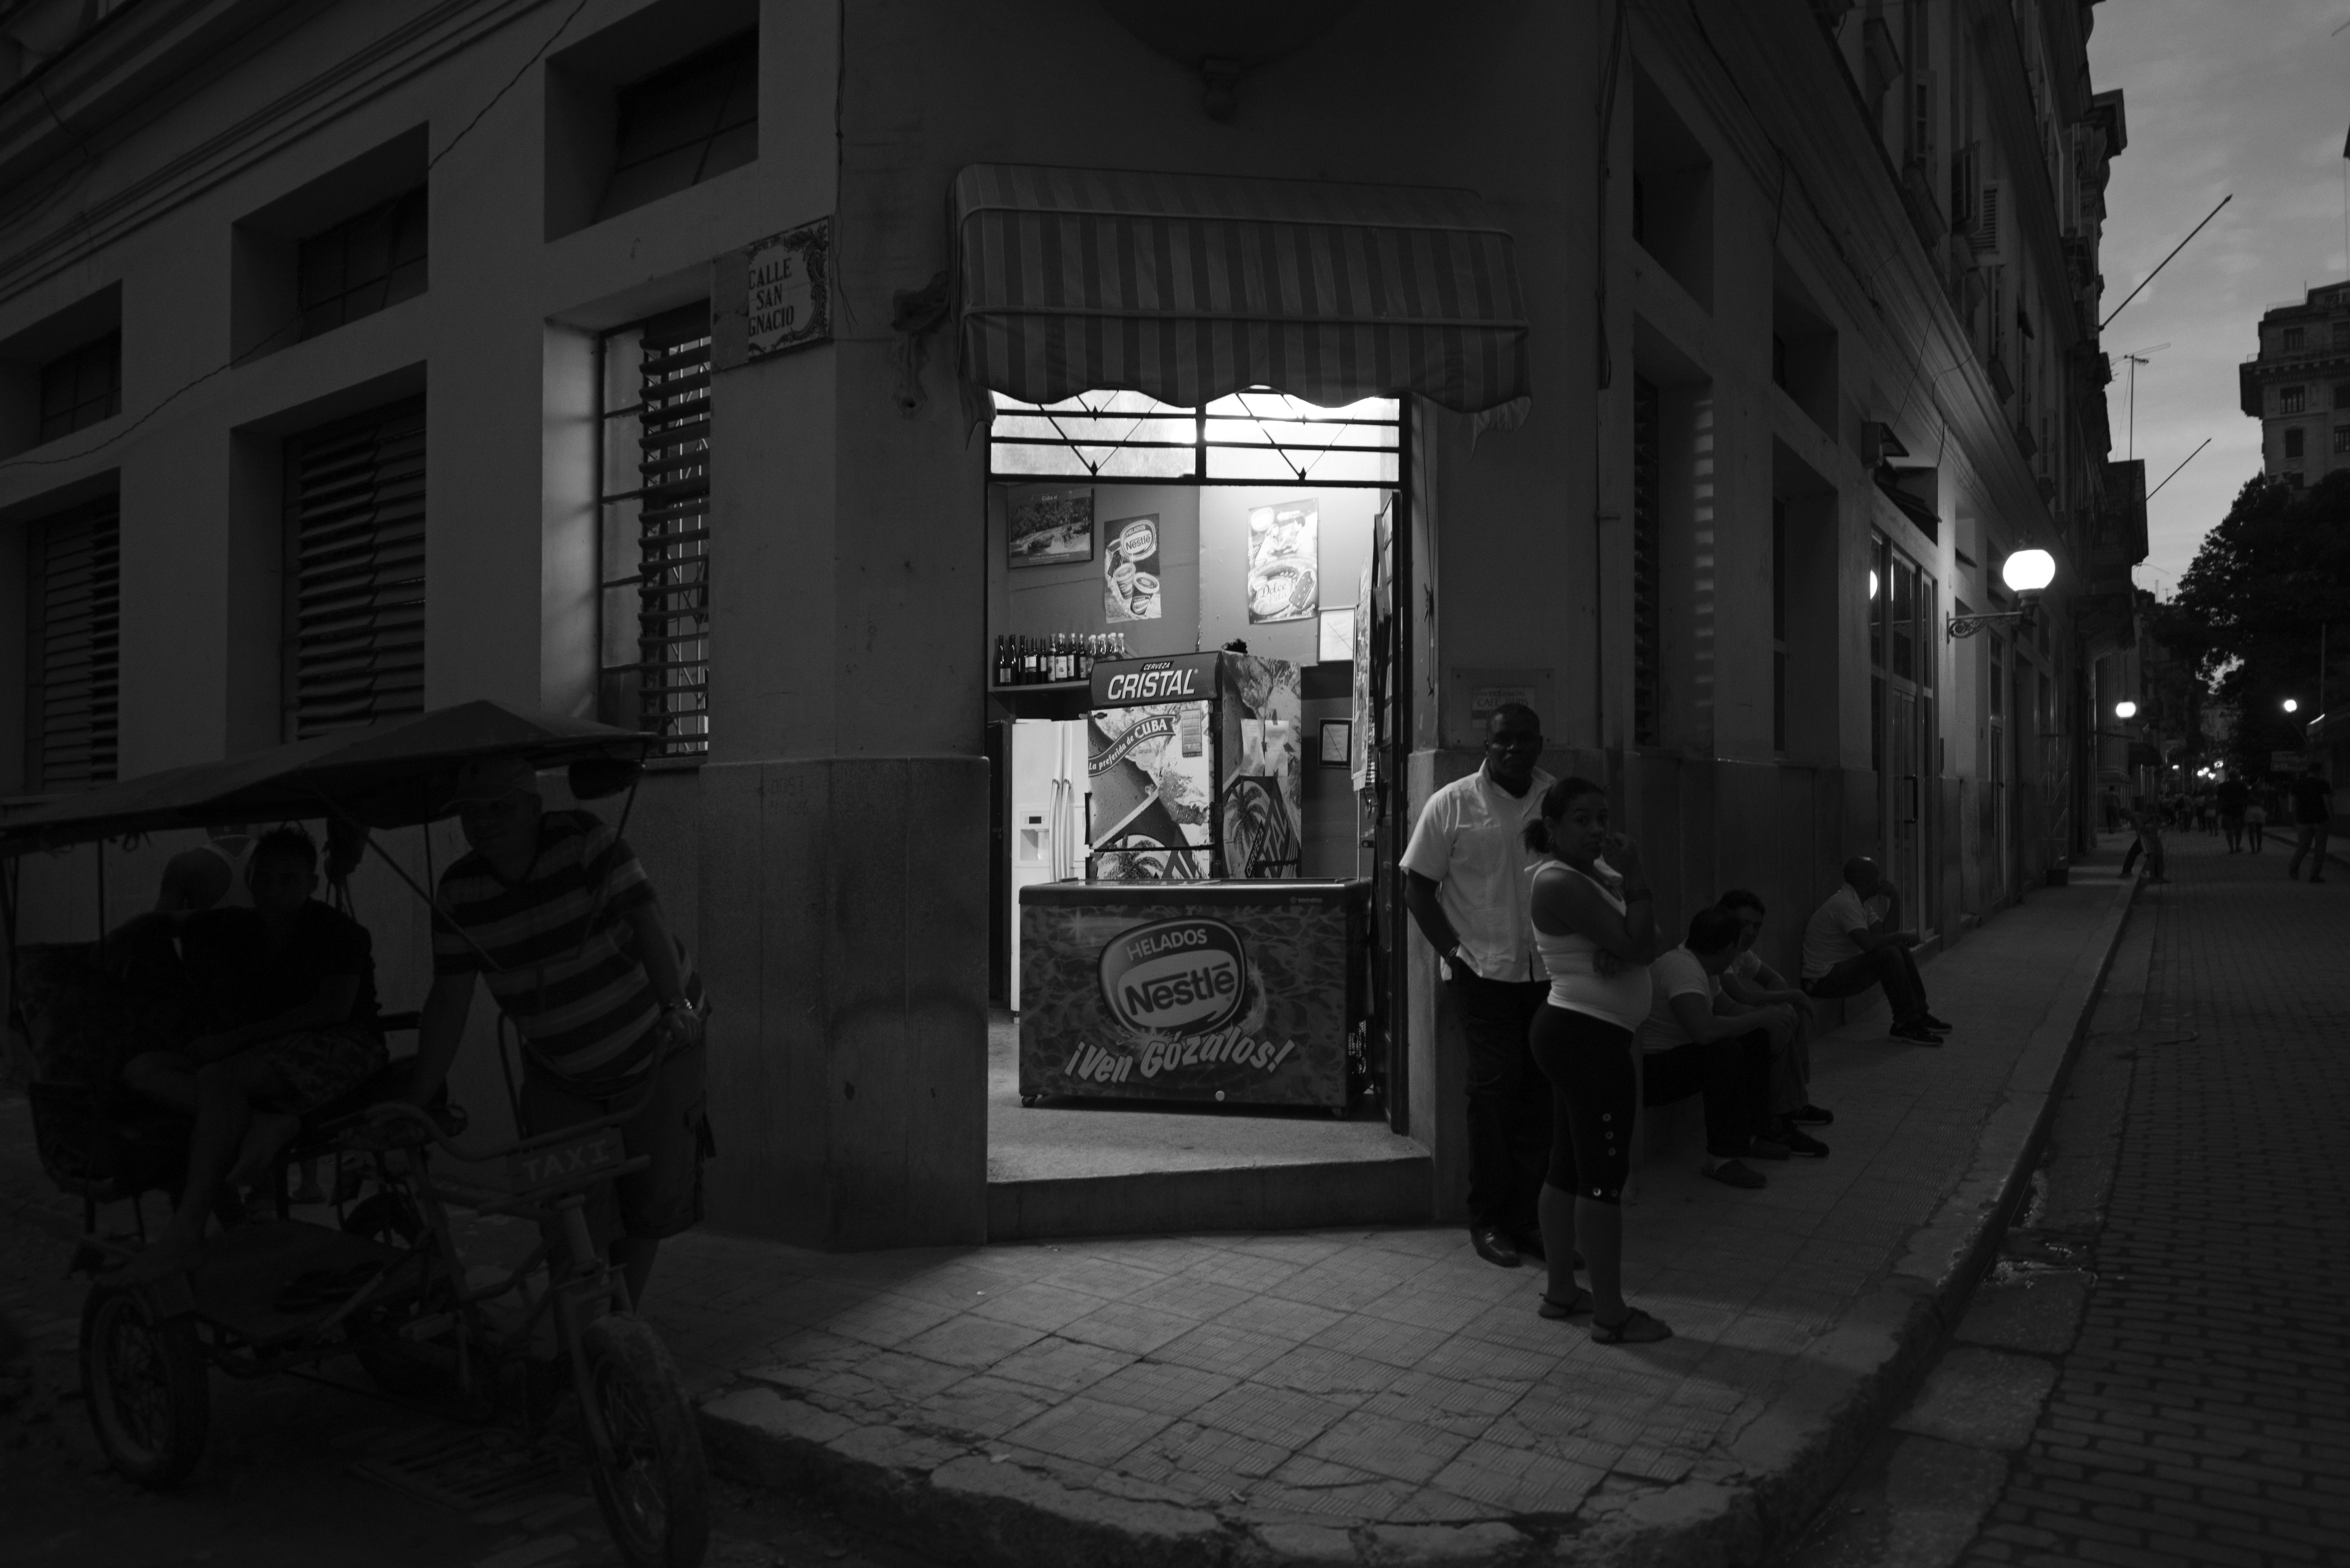 Havanna_kiosk på hjørne_2838Havanna_kiosk på hjørnelow